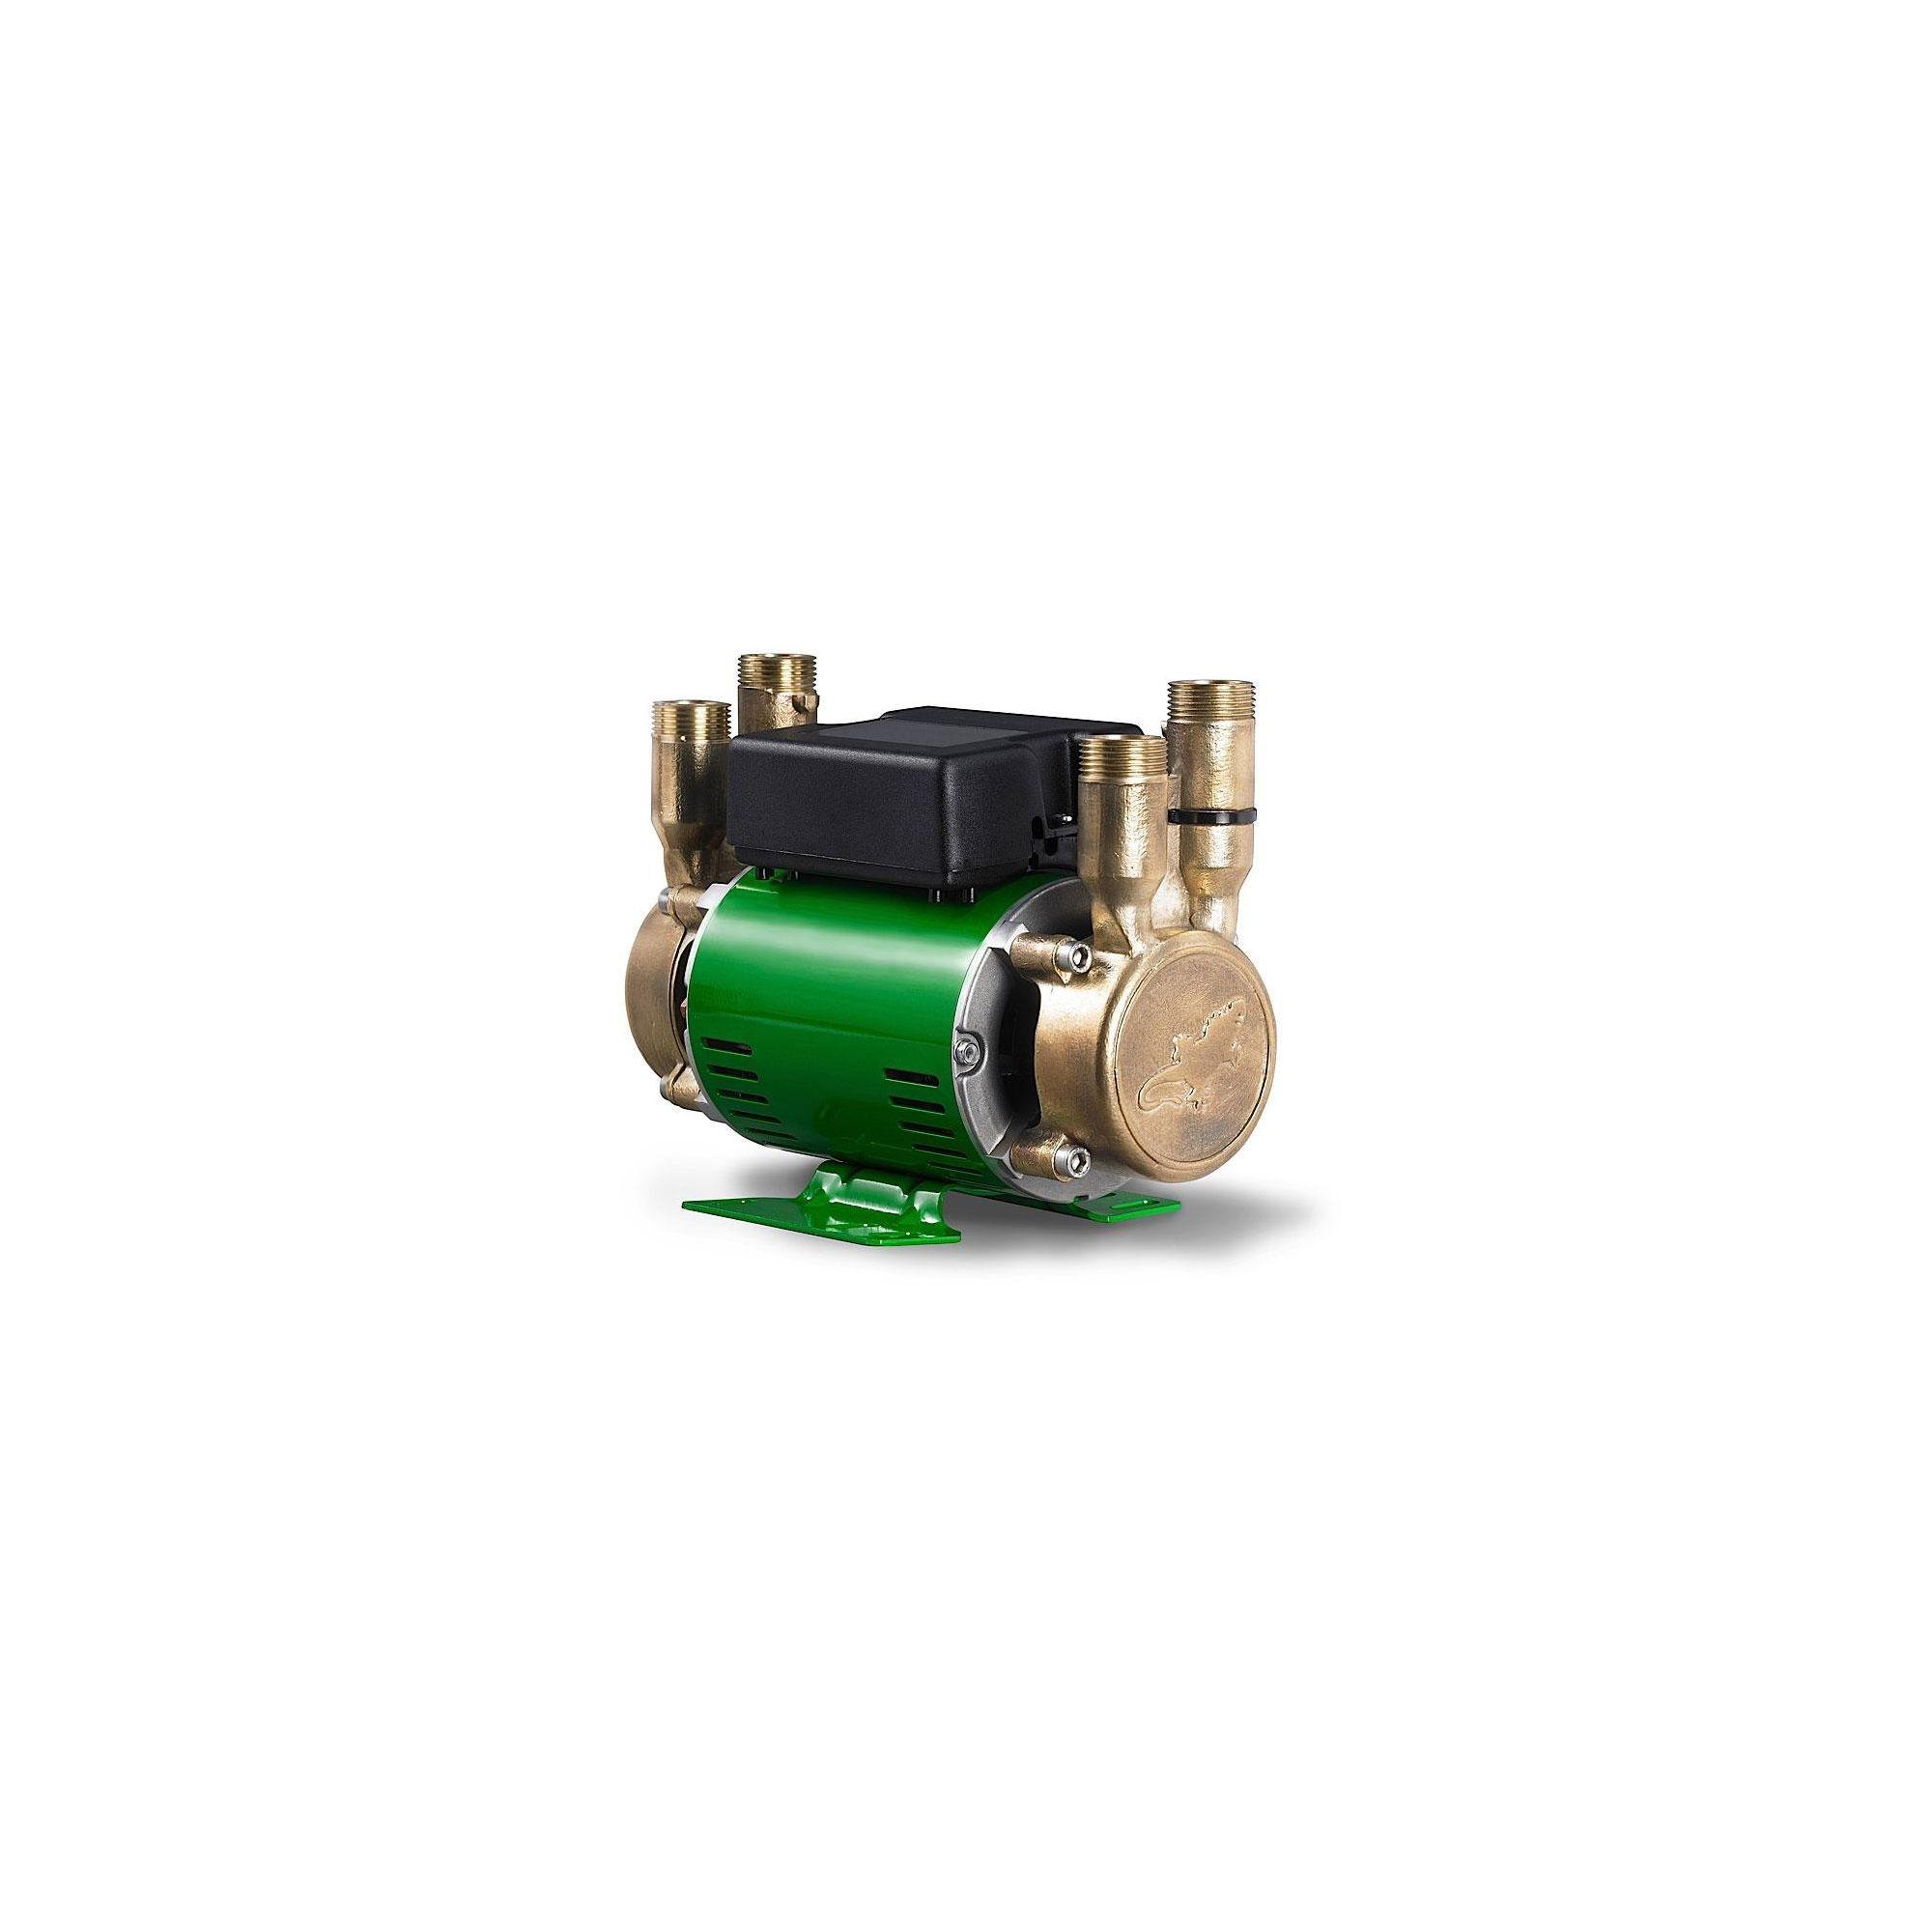 Salamander Force 20 PT Twin Impeller Shower Pump, Positive Head, 2.0 Bar at Tescos Direct